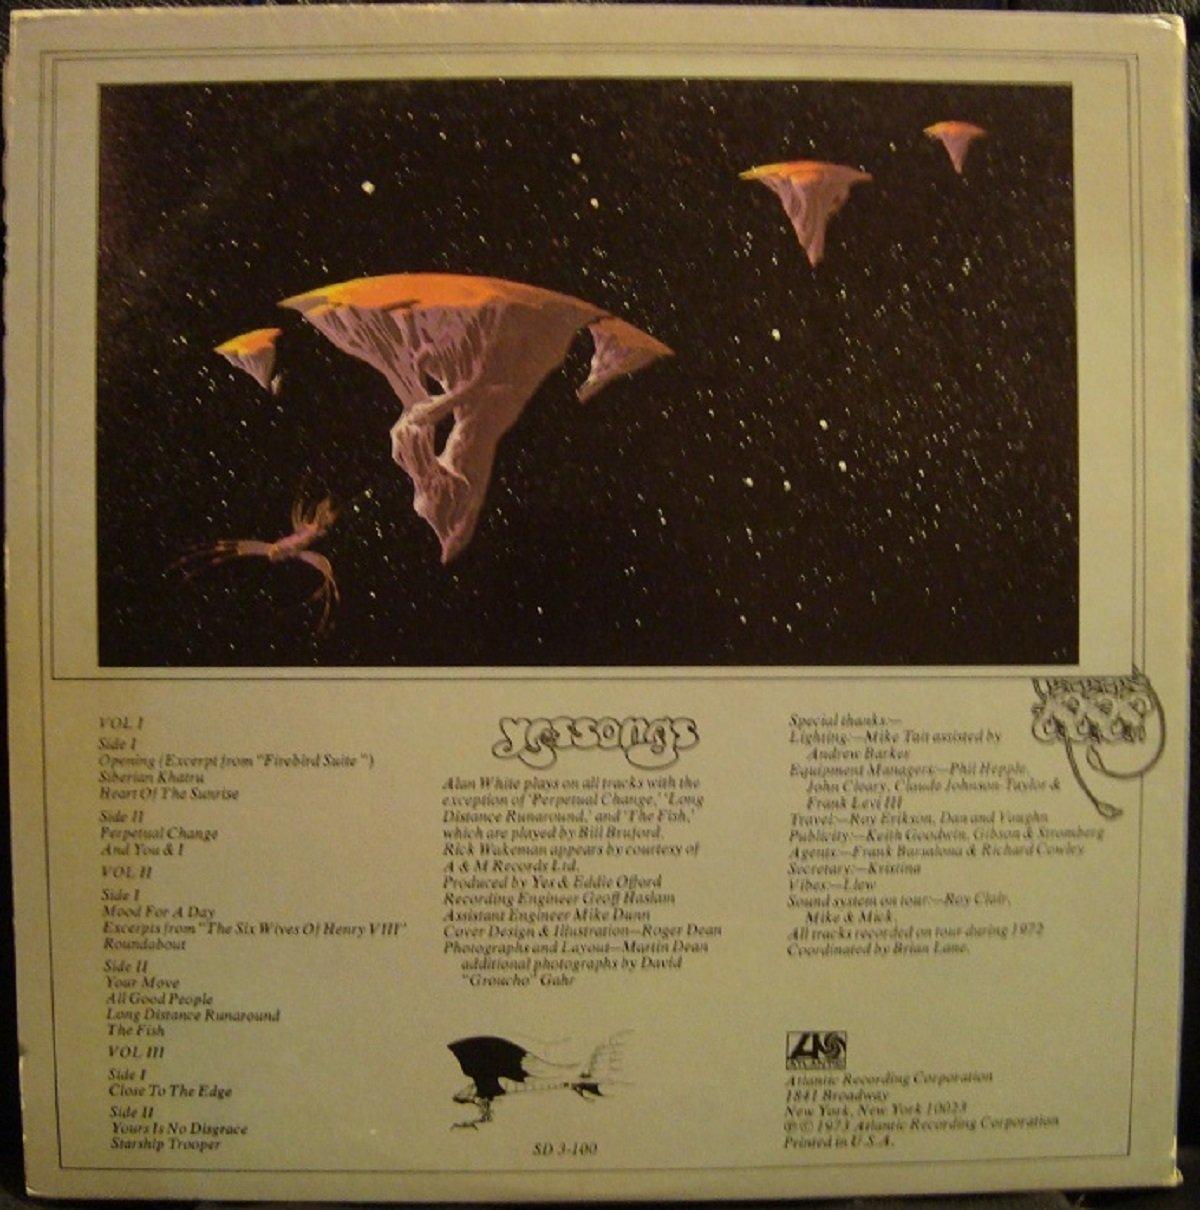 Yessongs Original recording